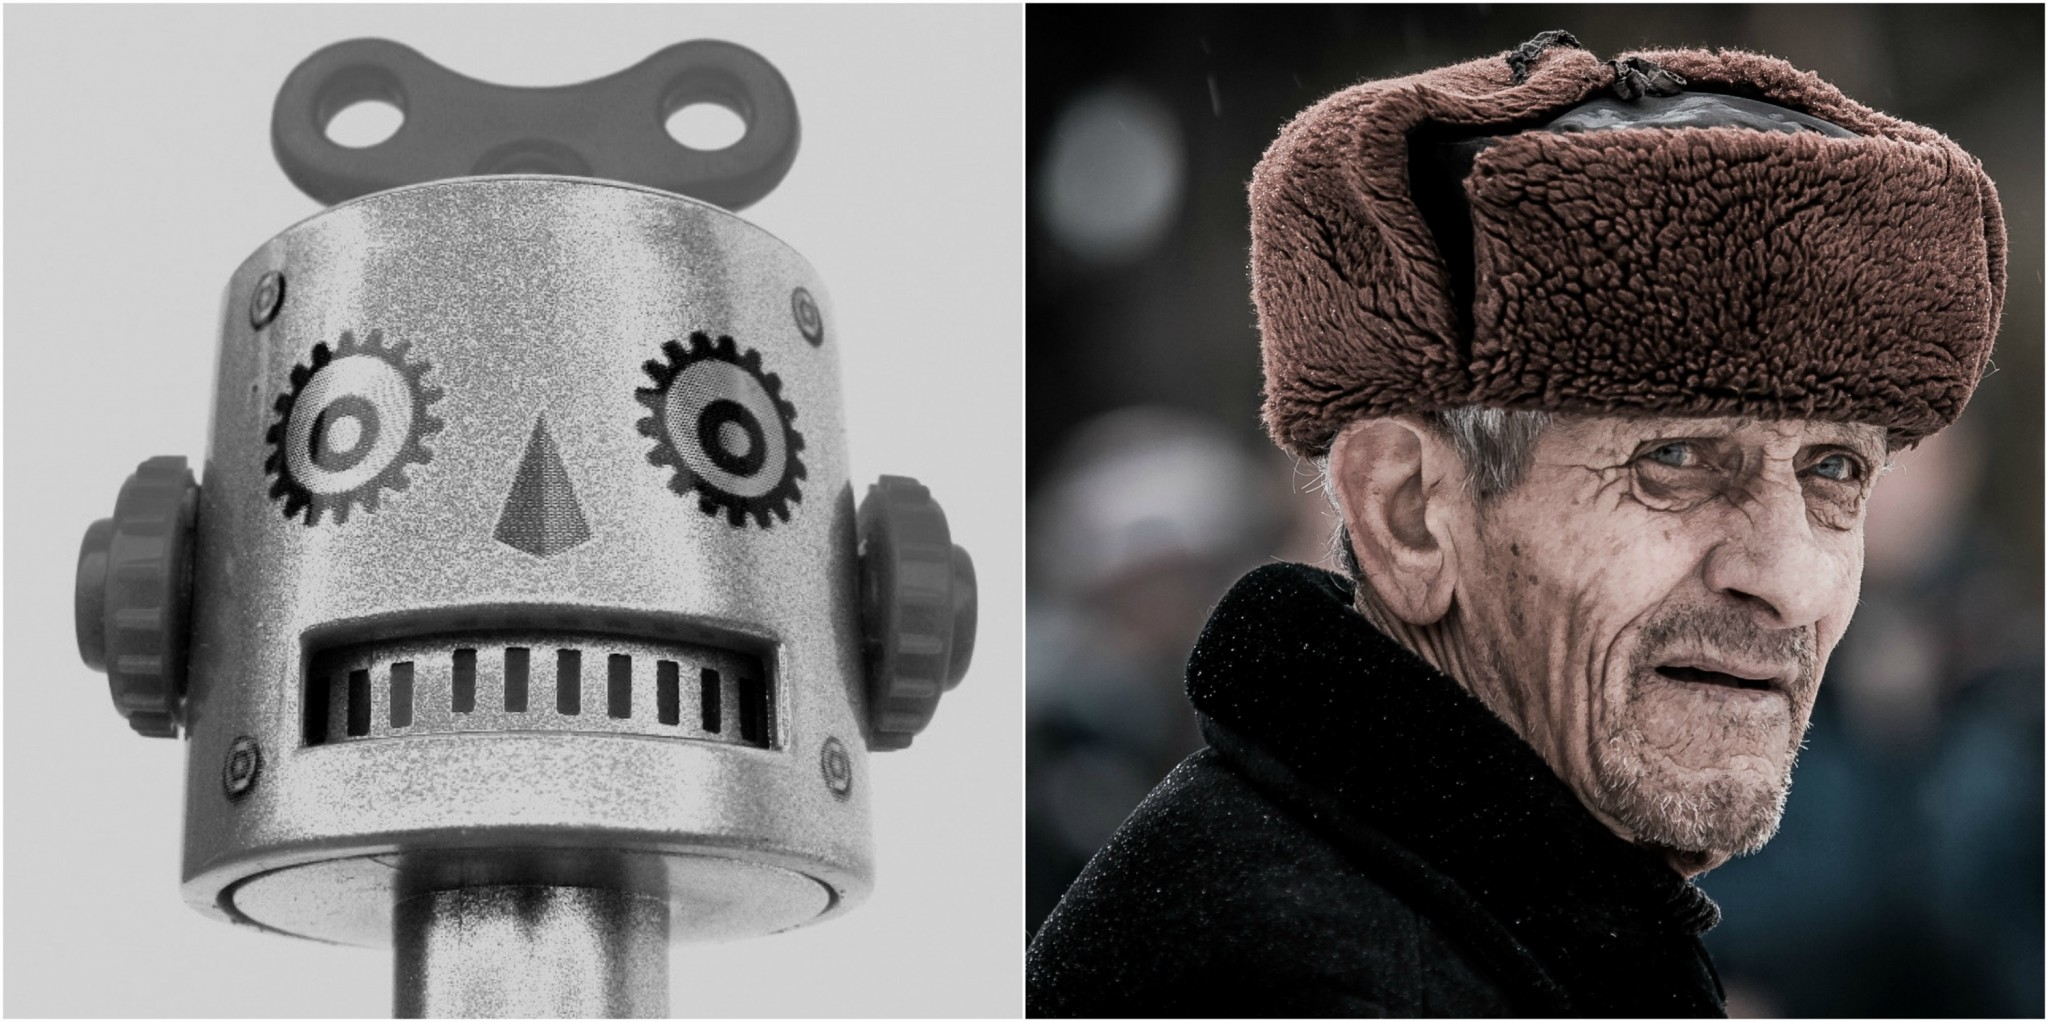 Robots could revolutionize the world of eldercare. Photos: Public domain.